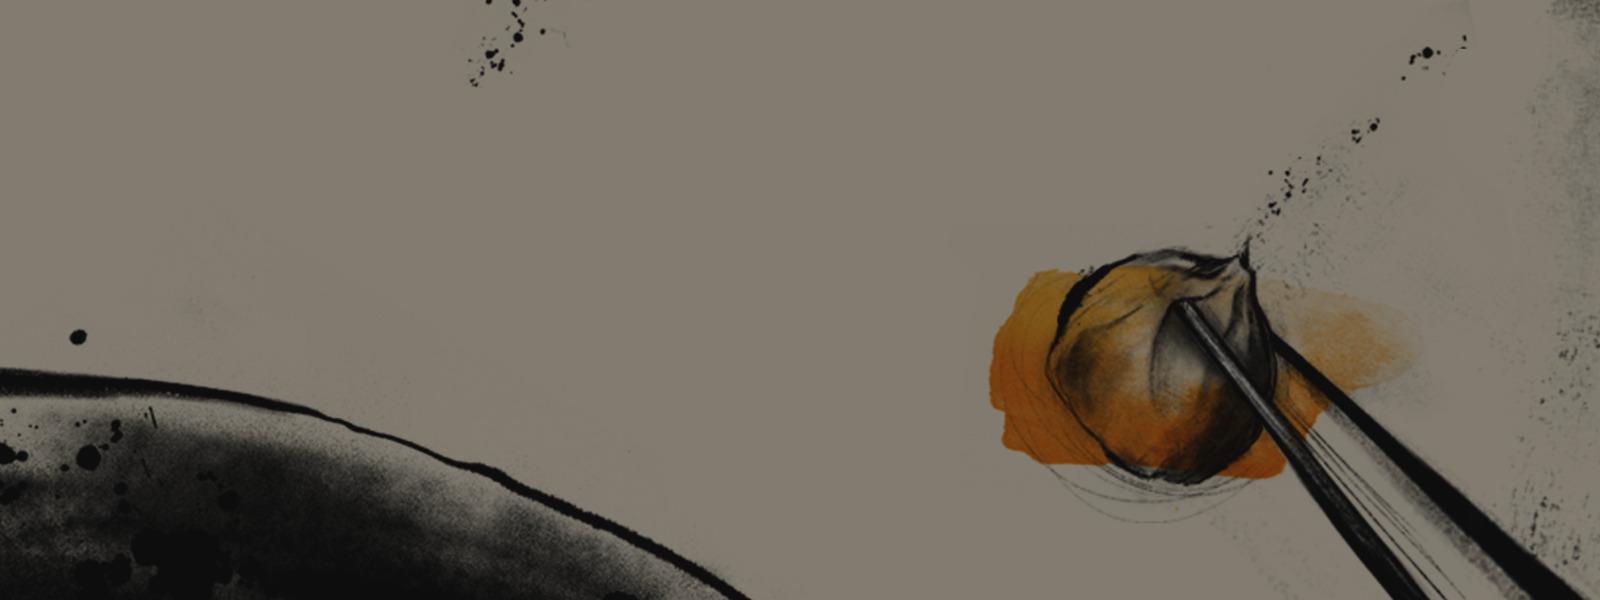 Background show artwork for The Test Kitchen: Christina Chaey's Manifesto